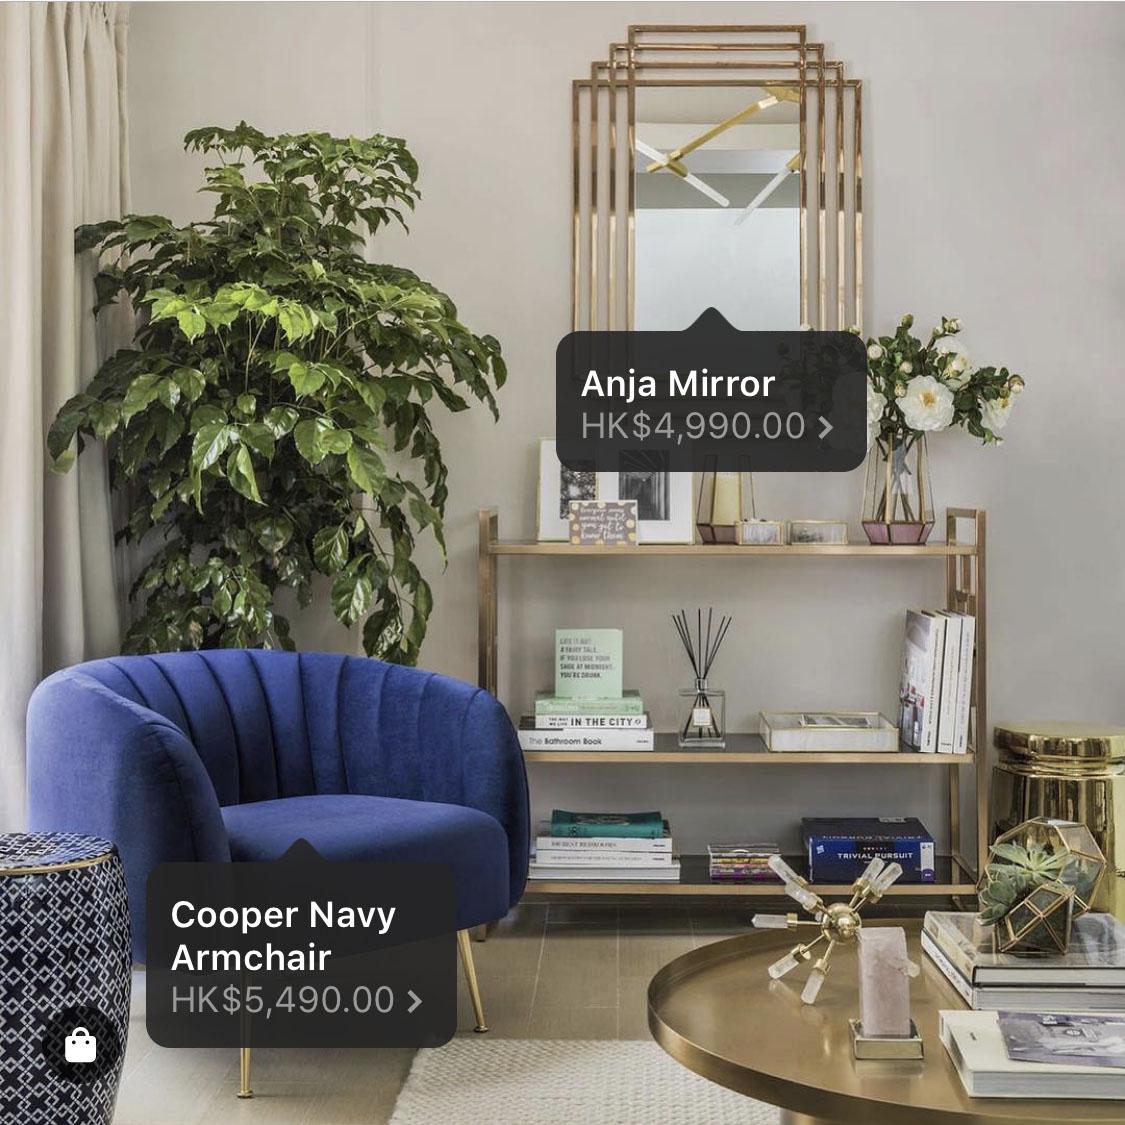 Instagram Shoppable Ads